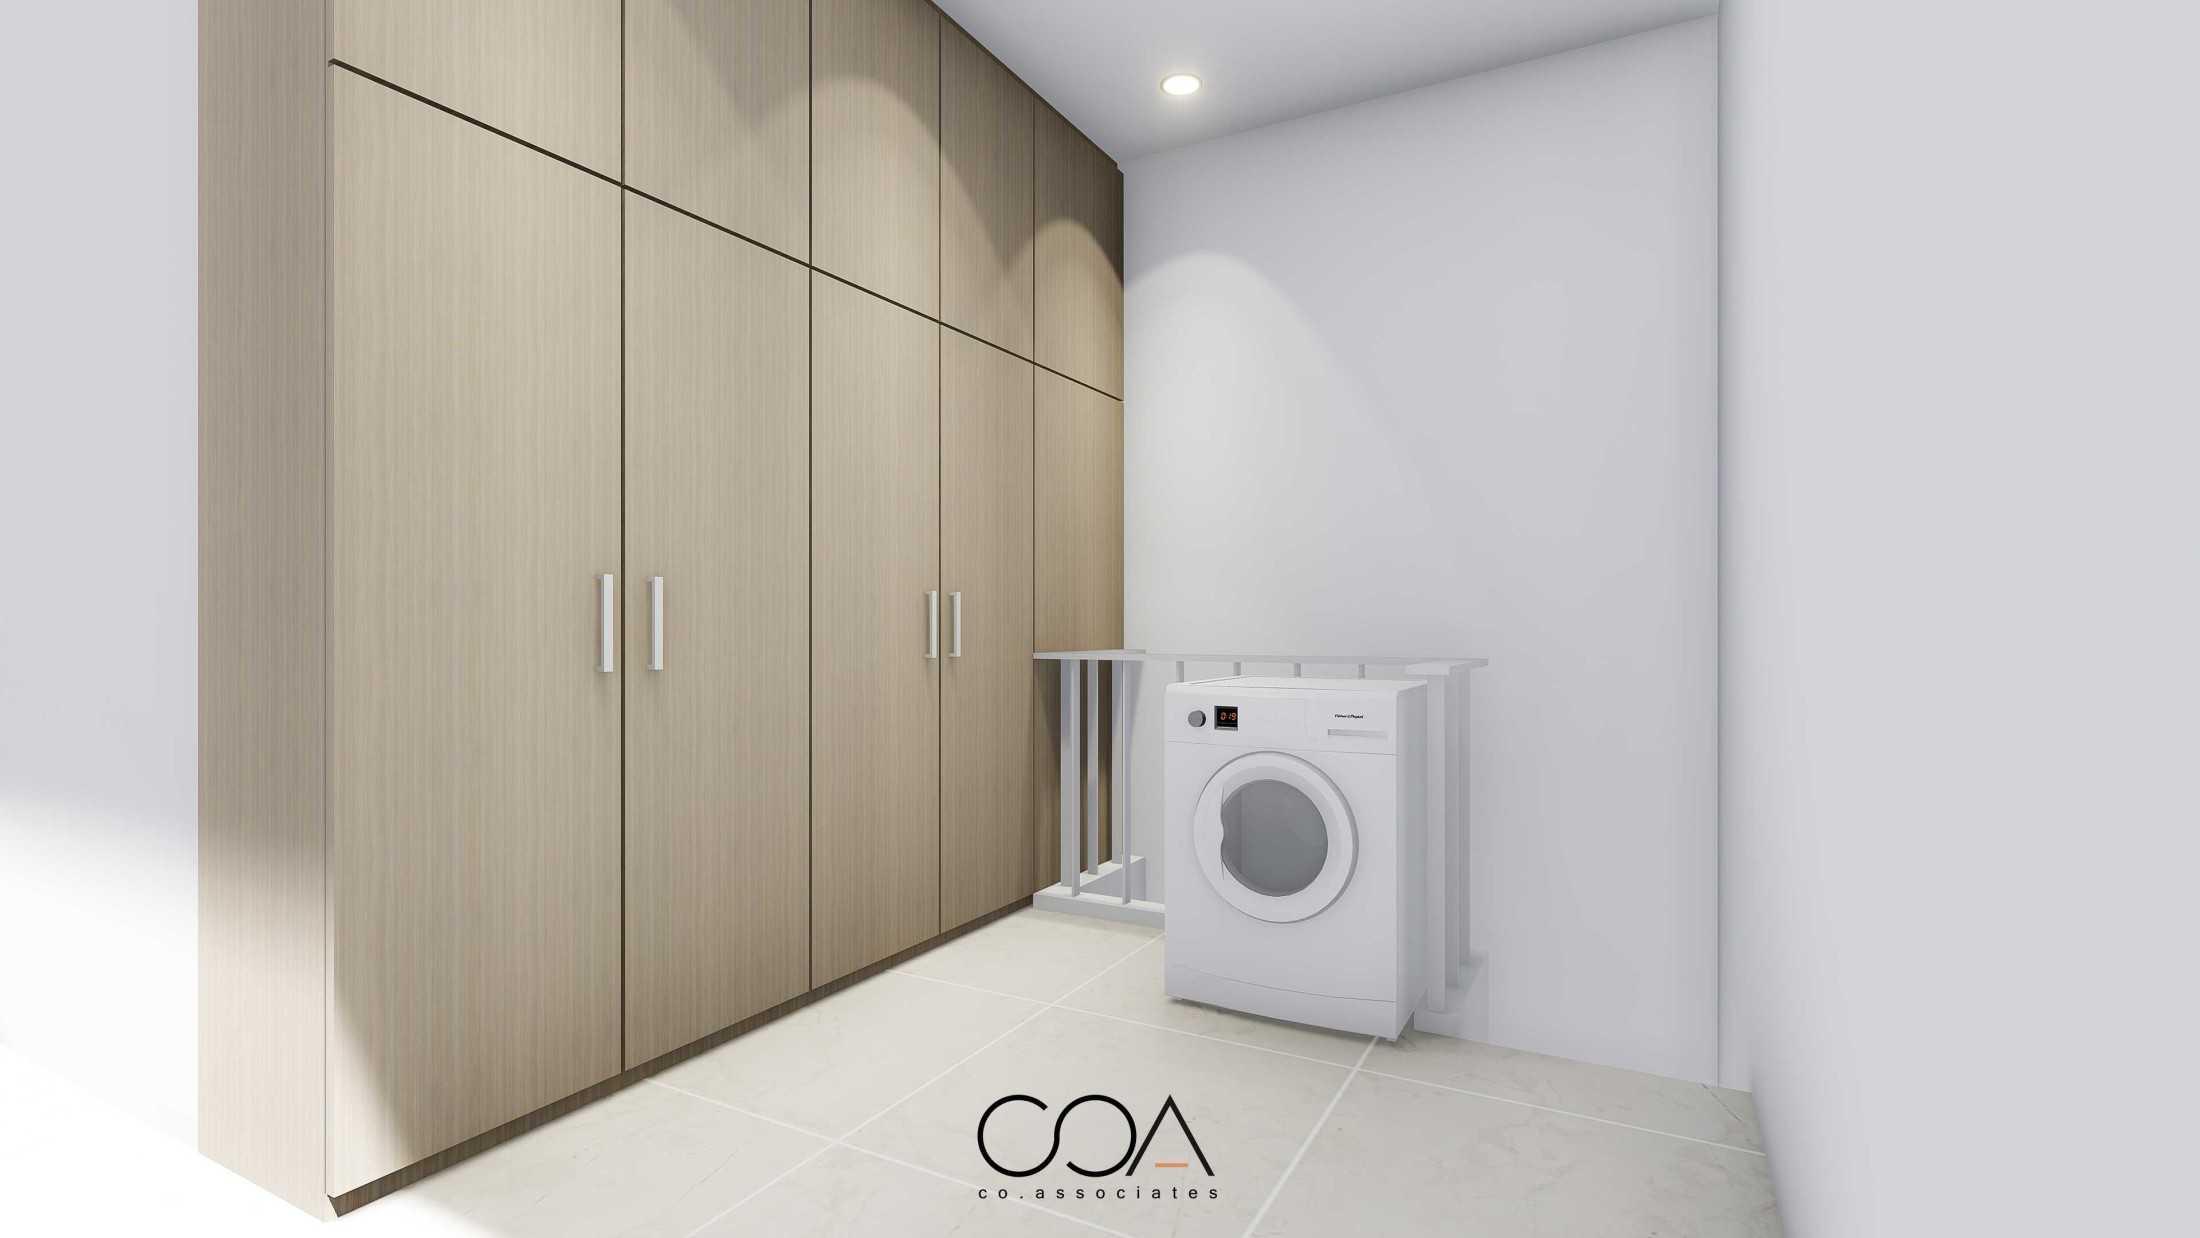 Foto inspirasi ide desain laundry Co-associates-jf-house oleh CO Associates di Arsitag